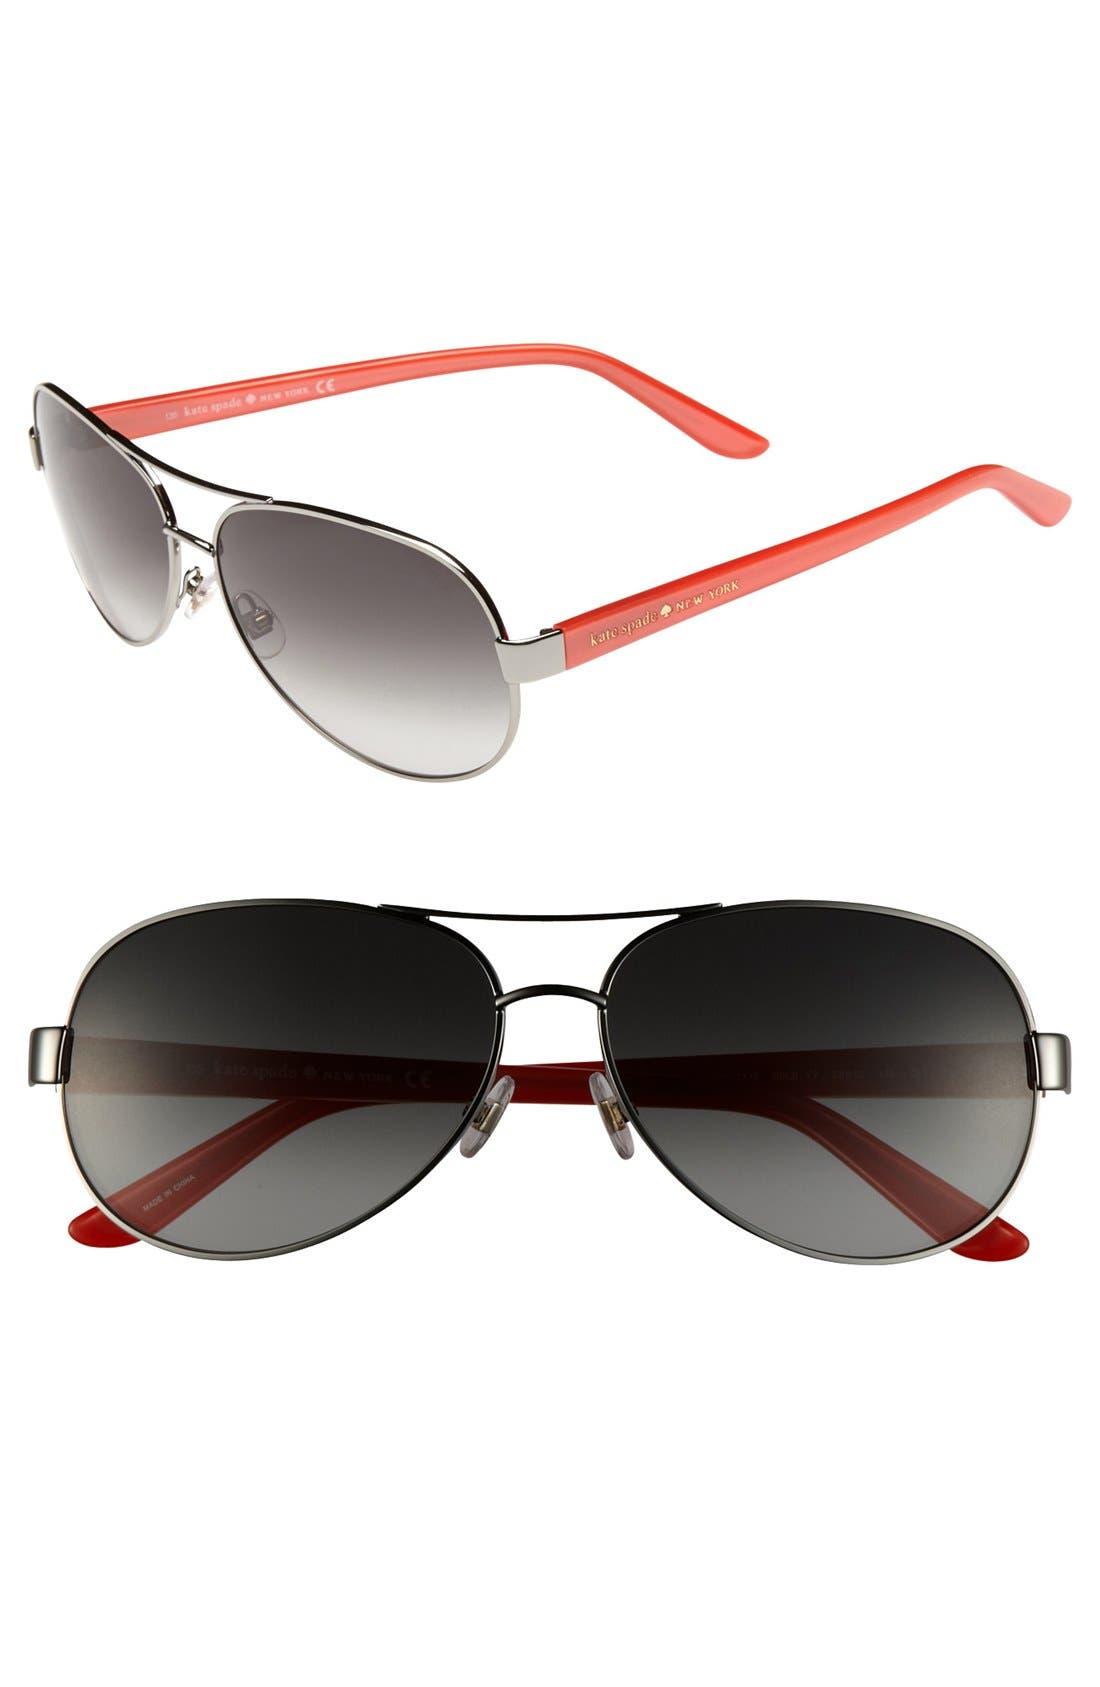 Main Image - kate spade new york 'donats' 58mm metal aviator sunglasses